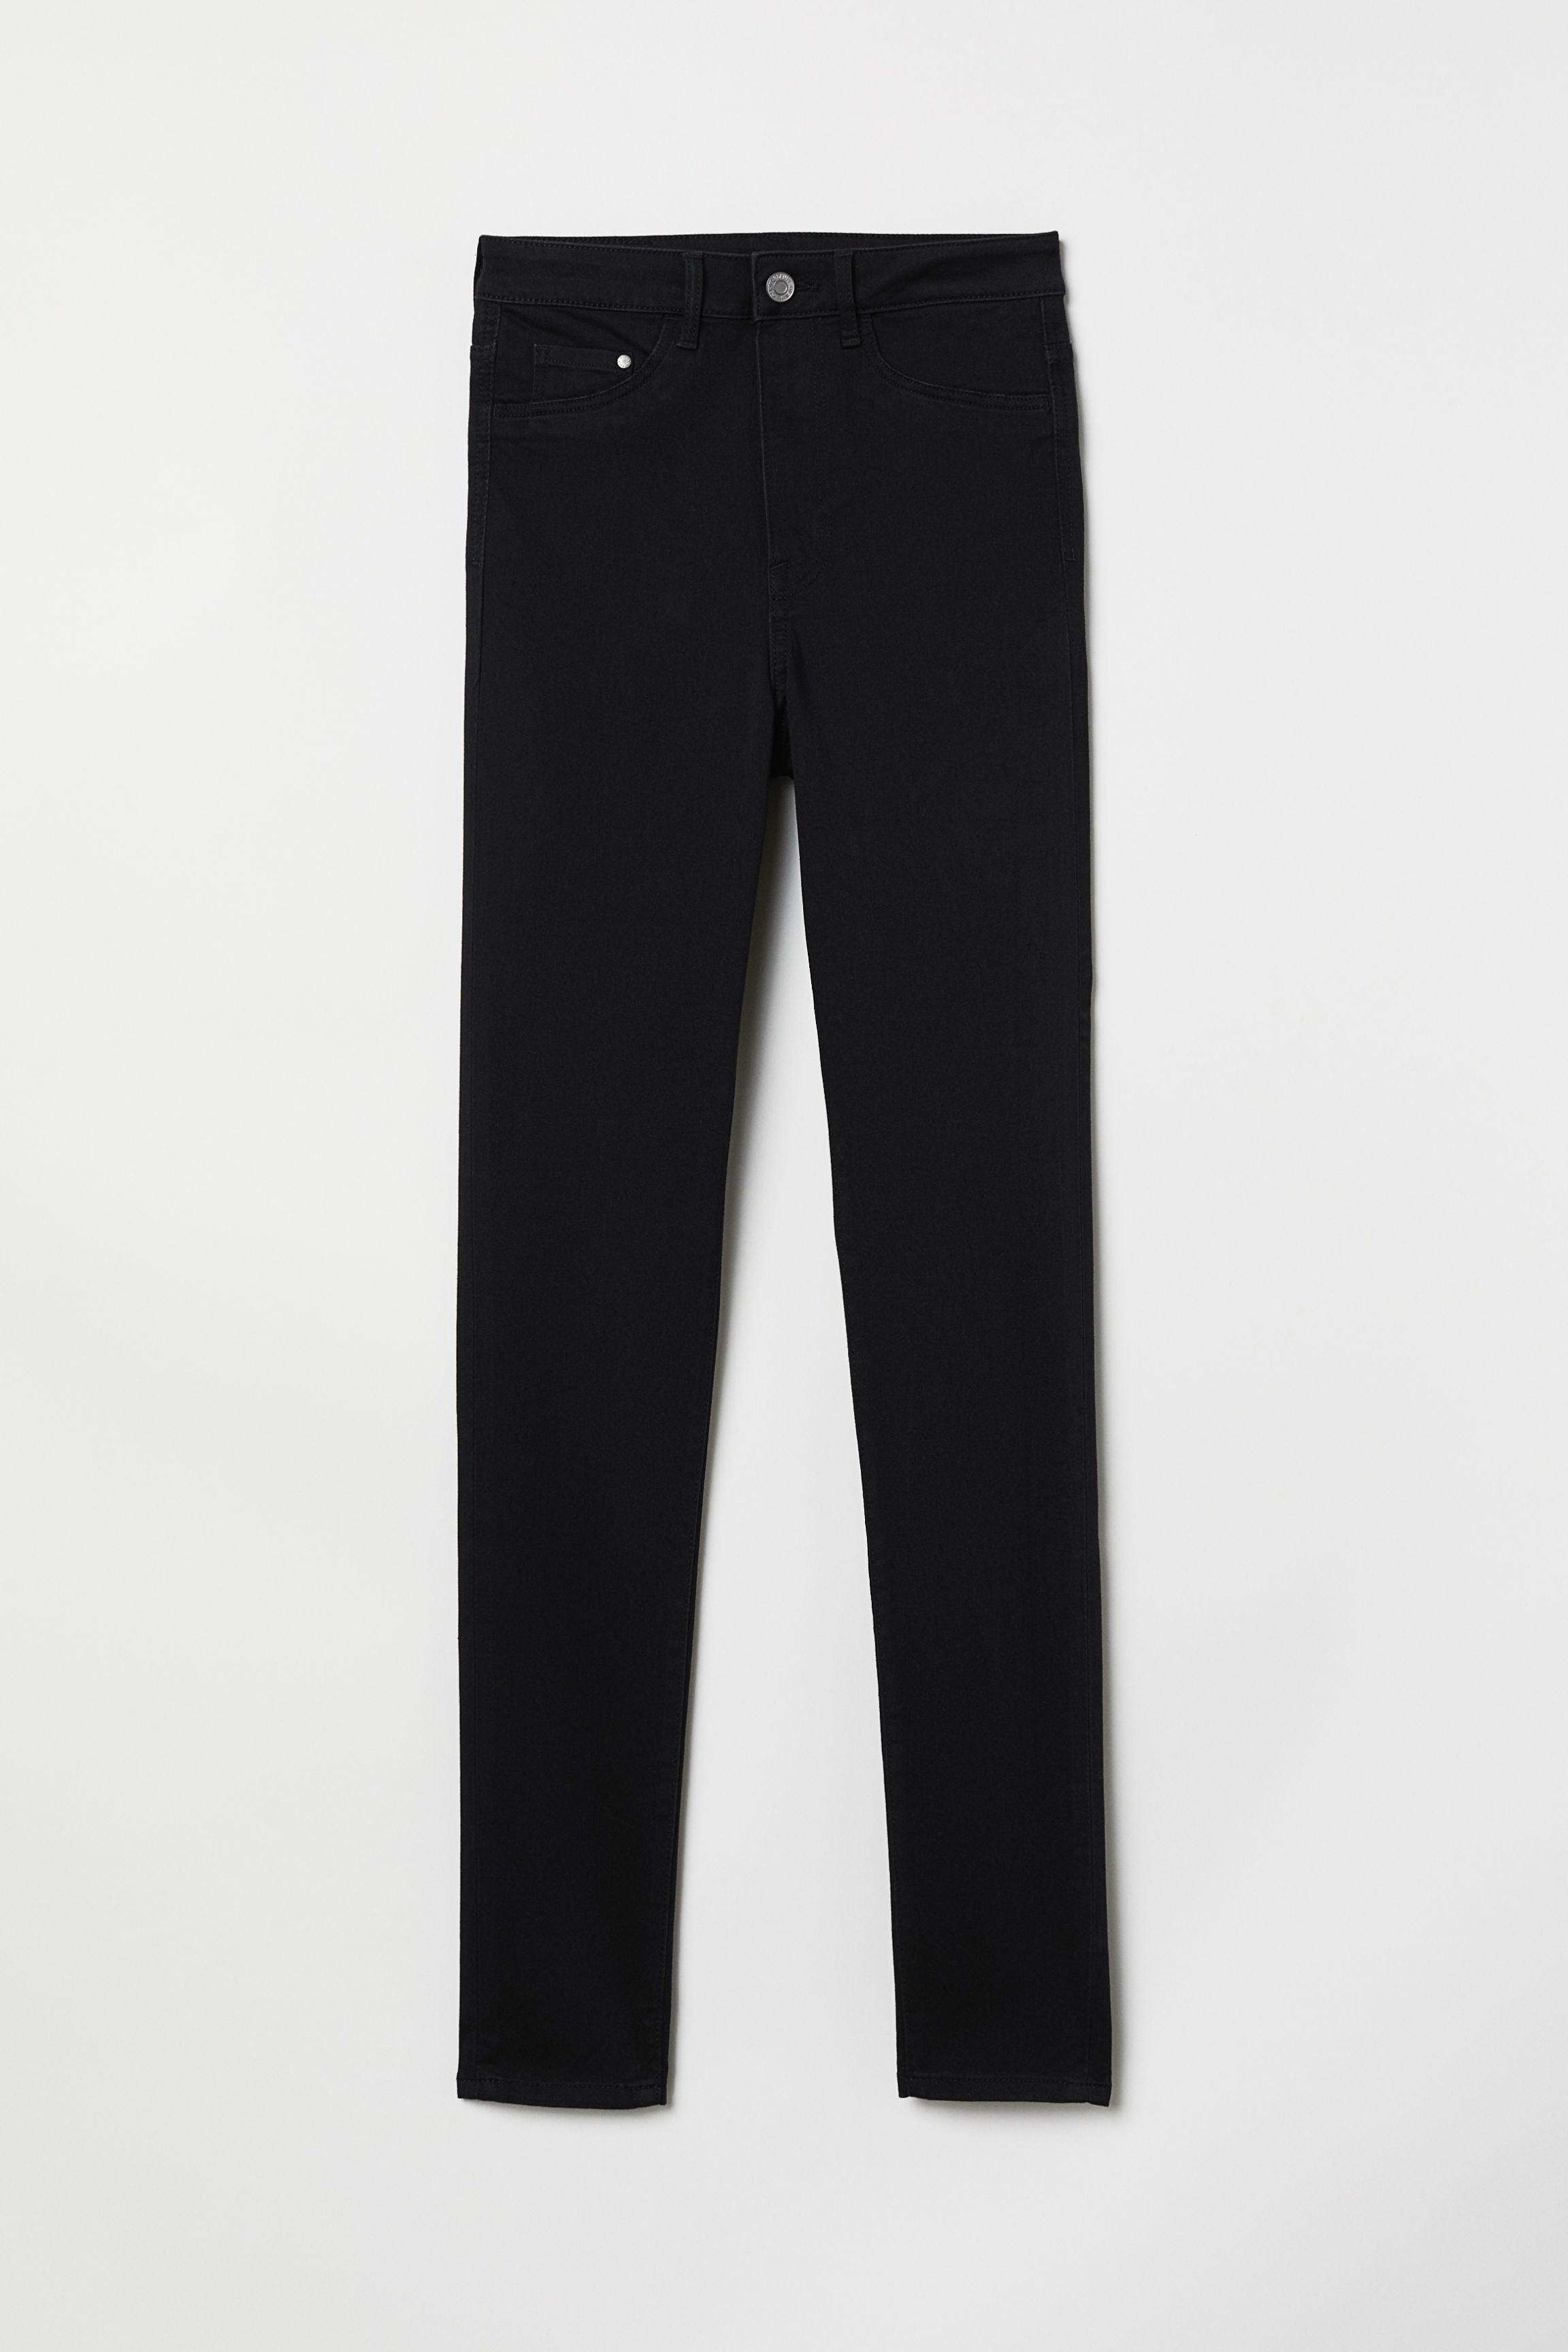 dcfb030f4c05c5 Super Skinny High Jeggings - Black - | H&M GB